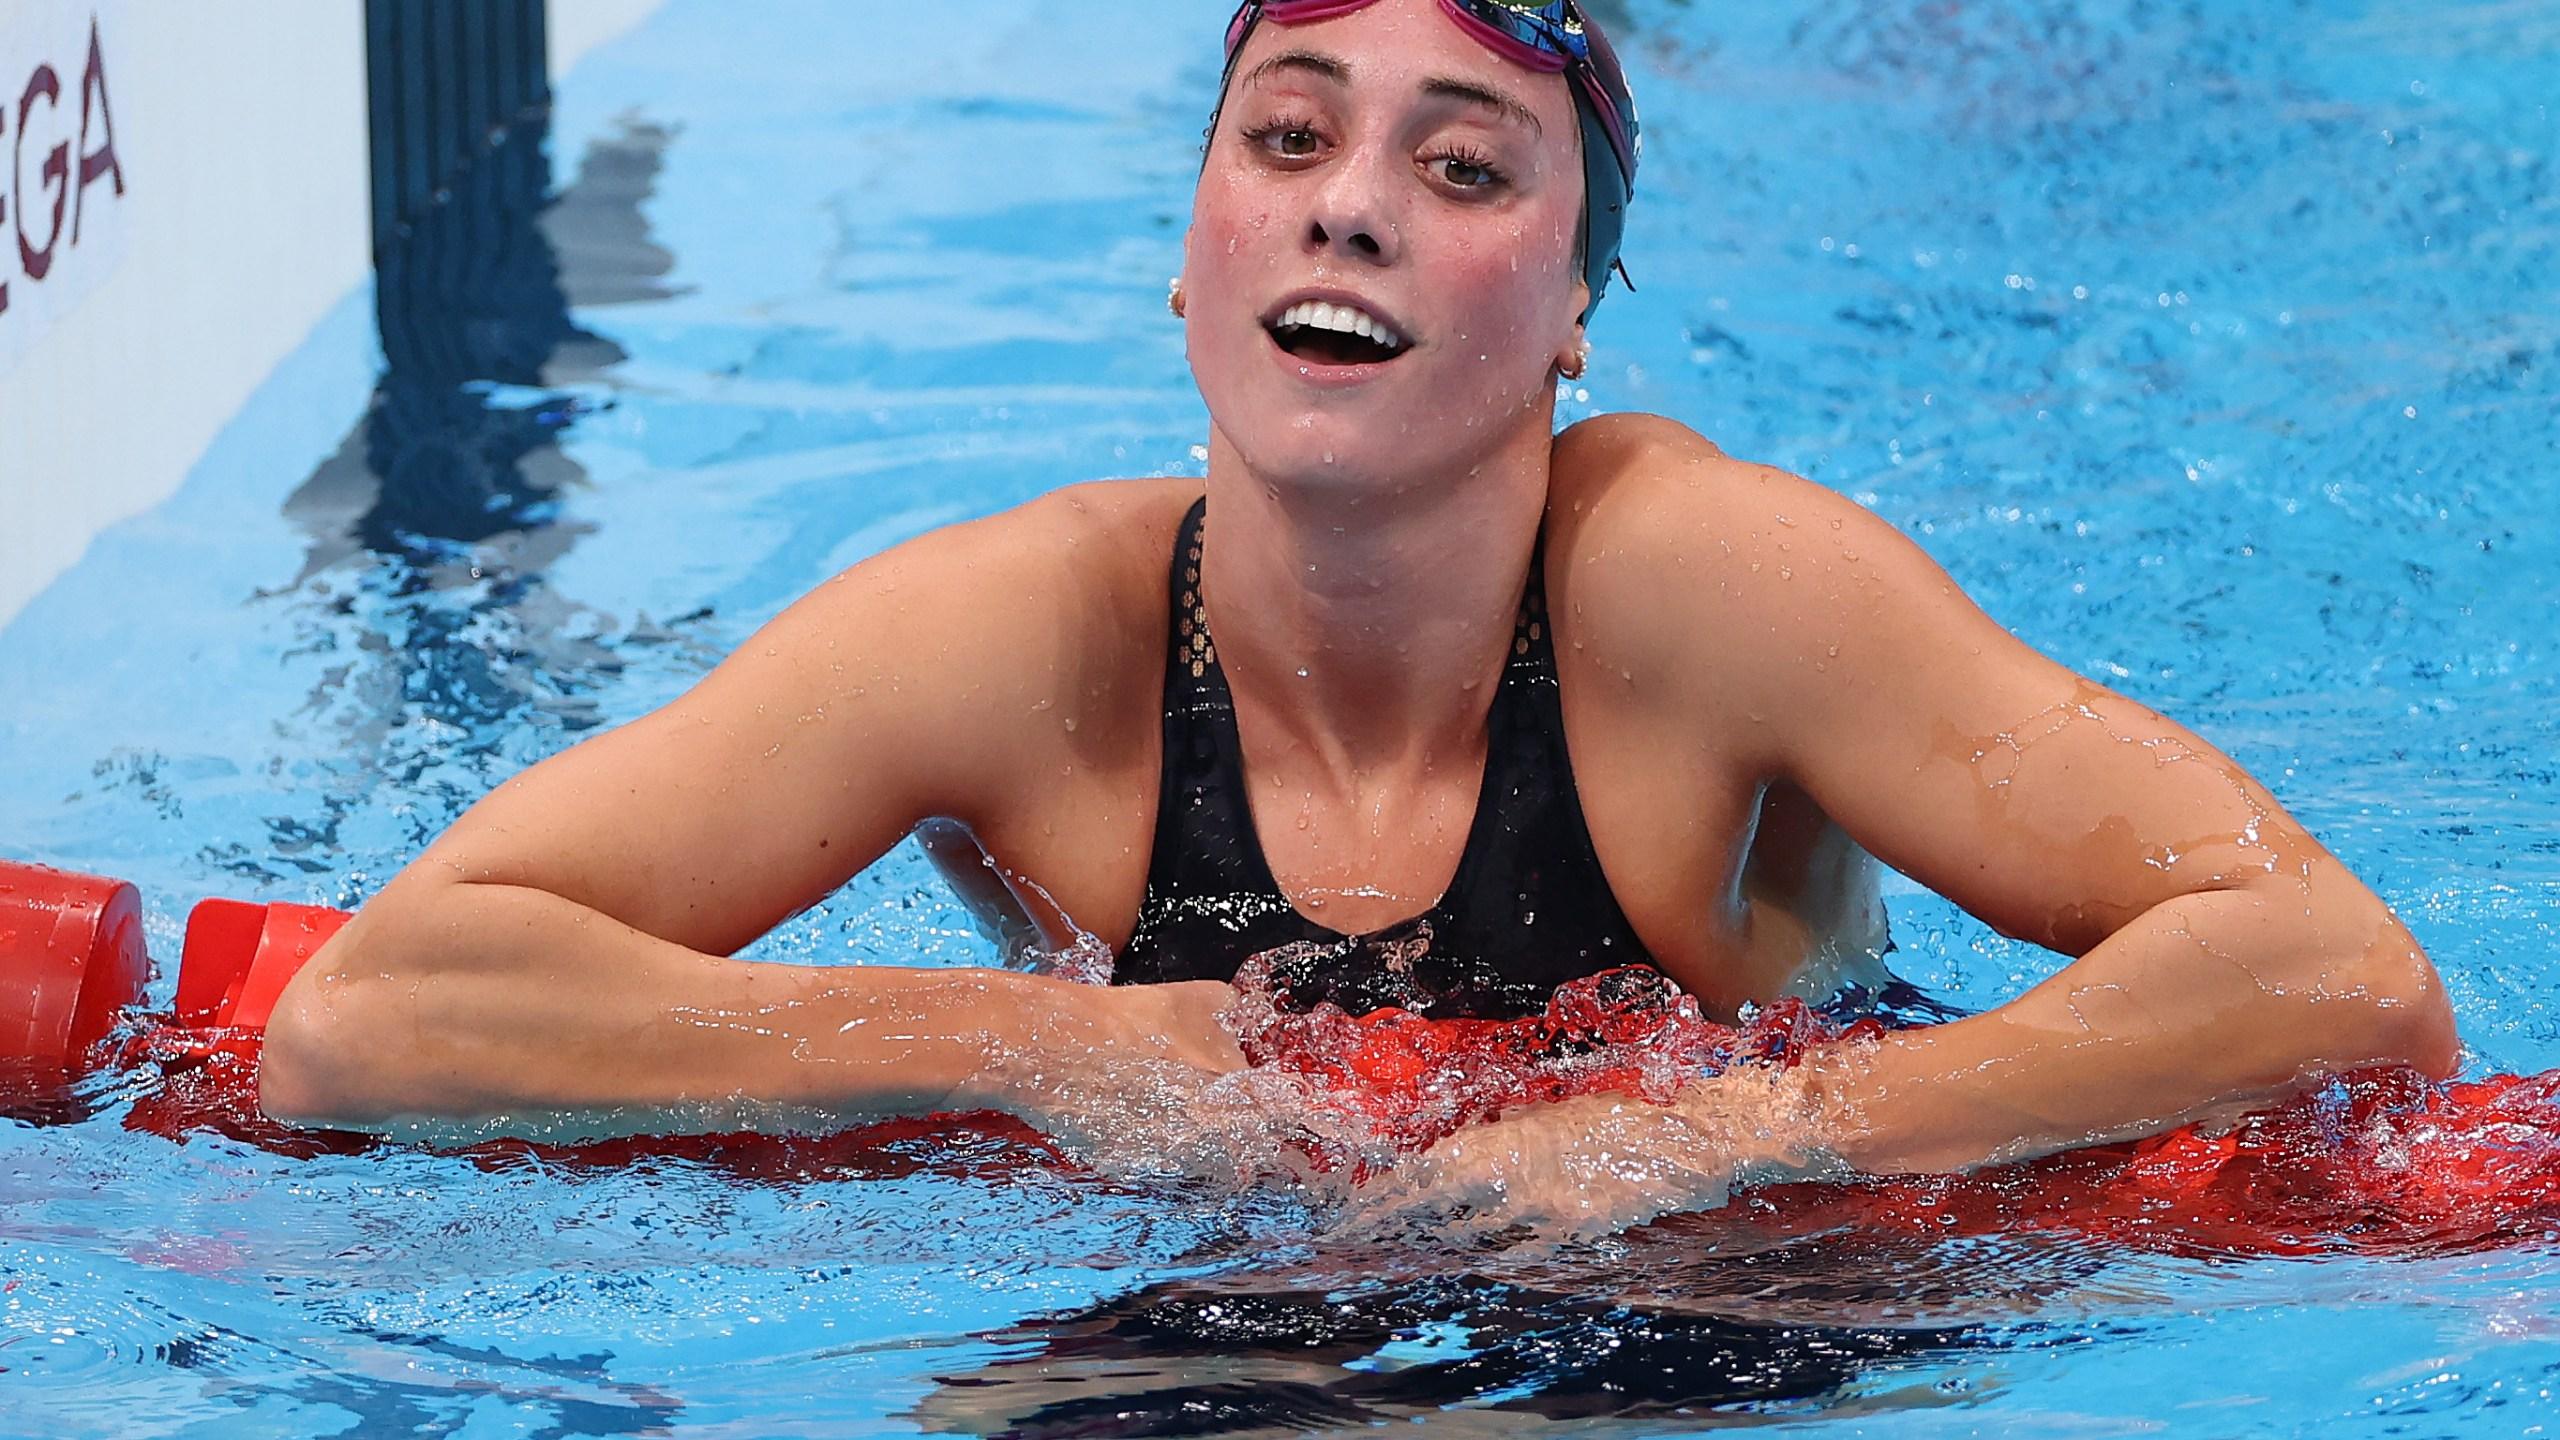 Incoming Uva Freshman Emma Weyant Grabs Silver In Olympic Debut Wfxrtv